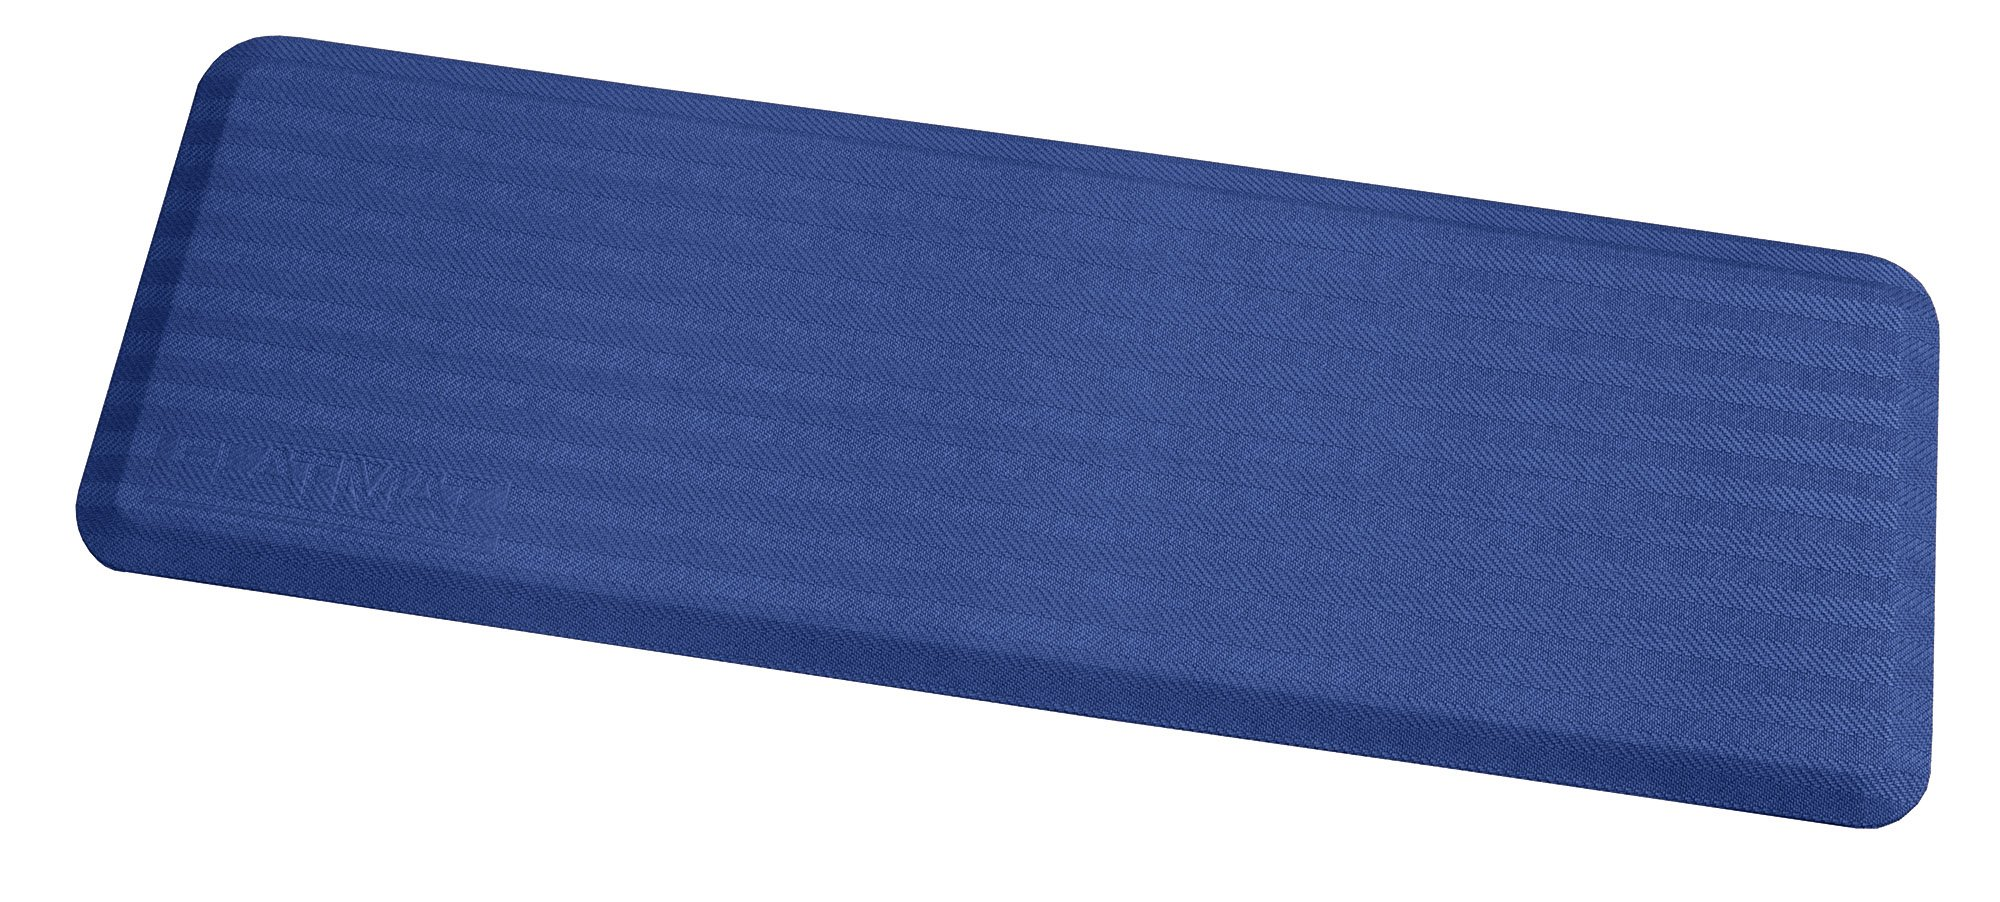 Arrowhead Healthcare Supply P-107350-36-07 FLATMAT, 36'' Wide, Bedside Fall Mat, Blue, Woven Pattern